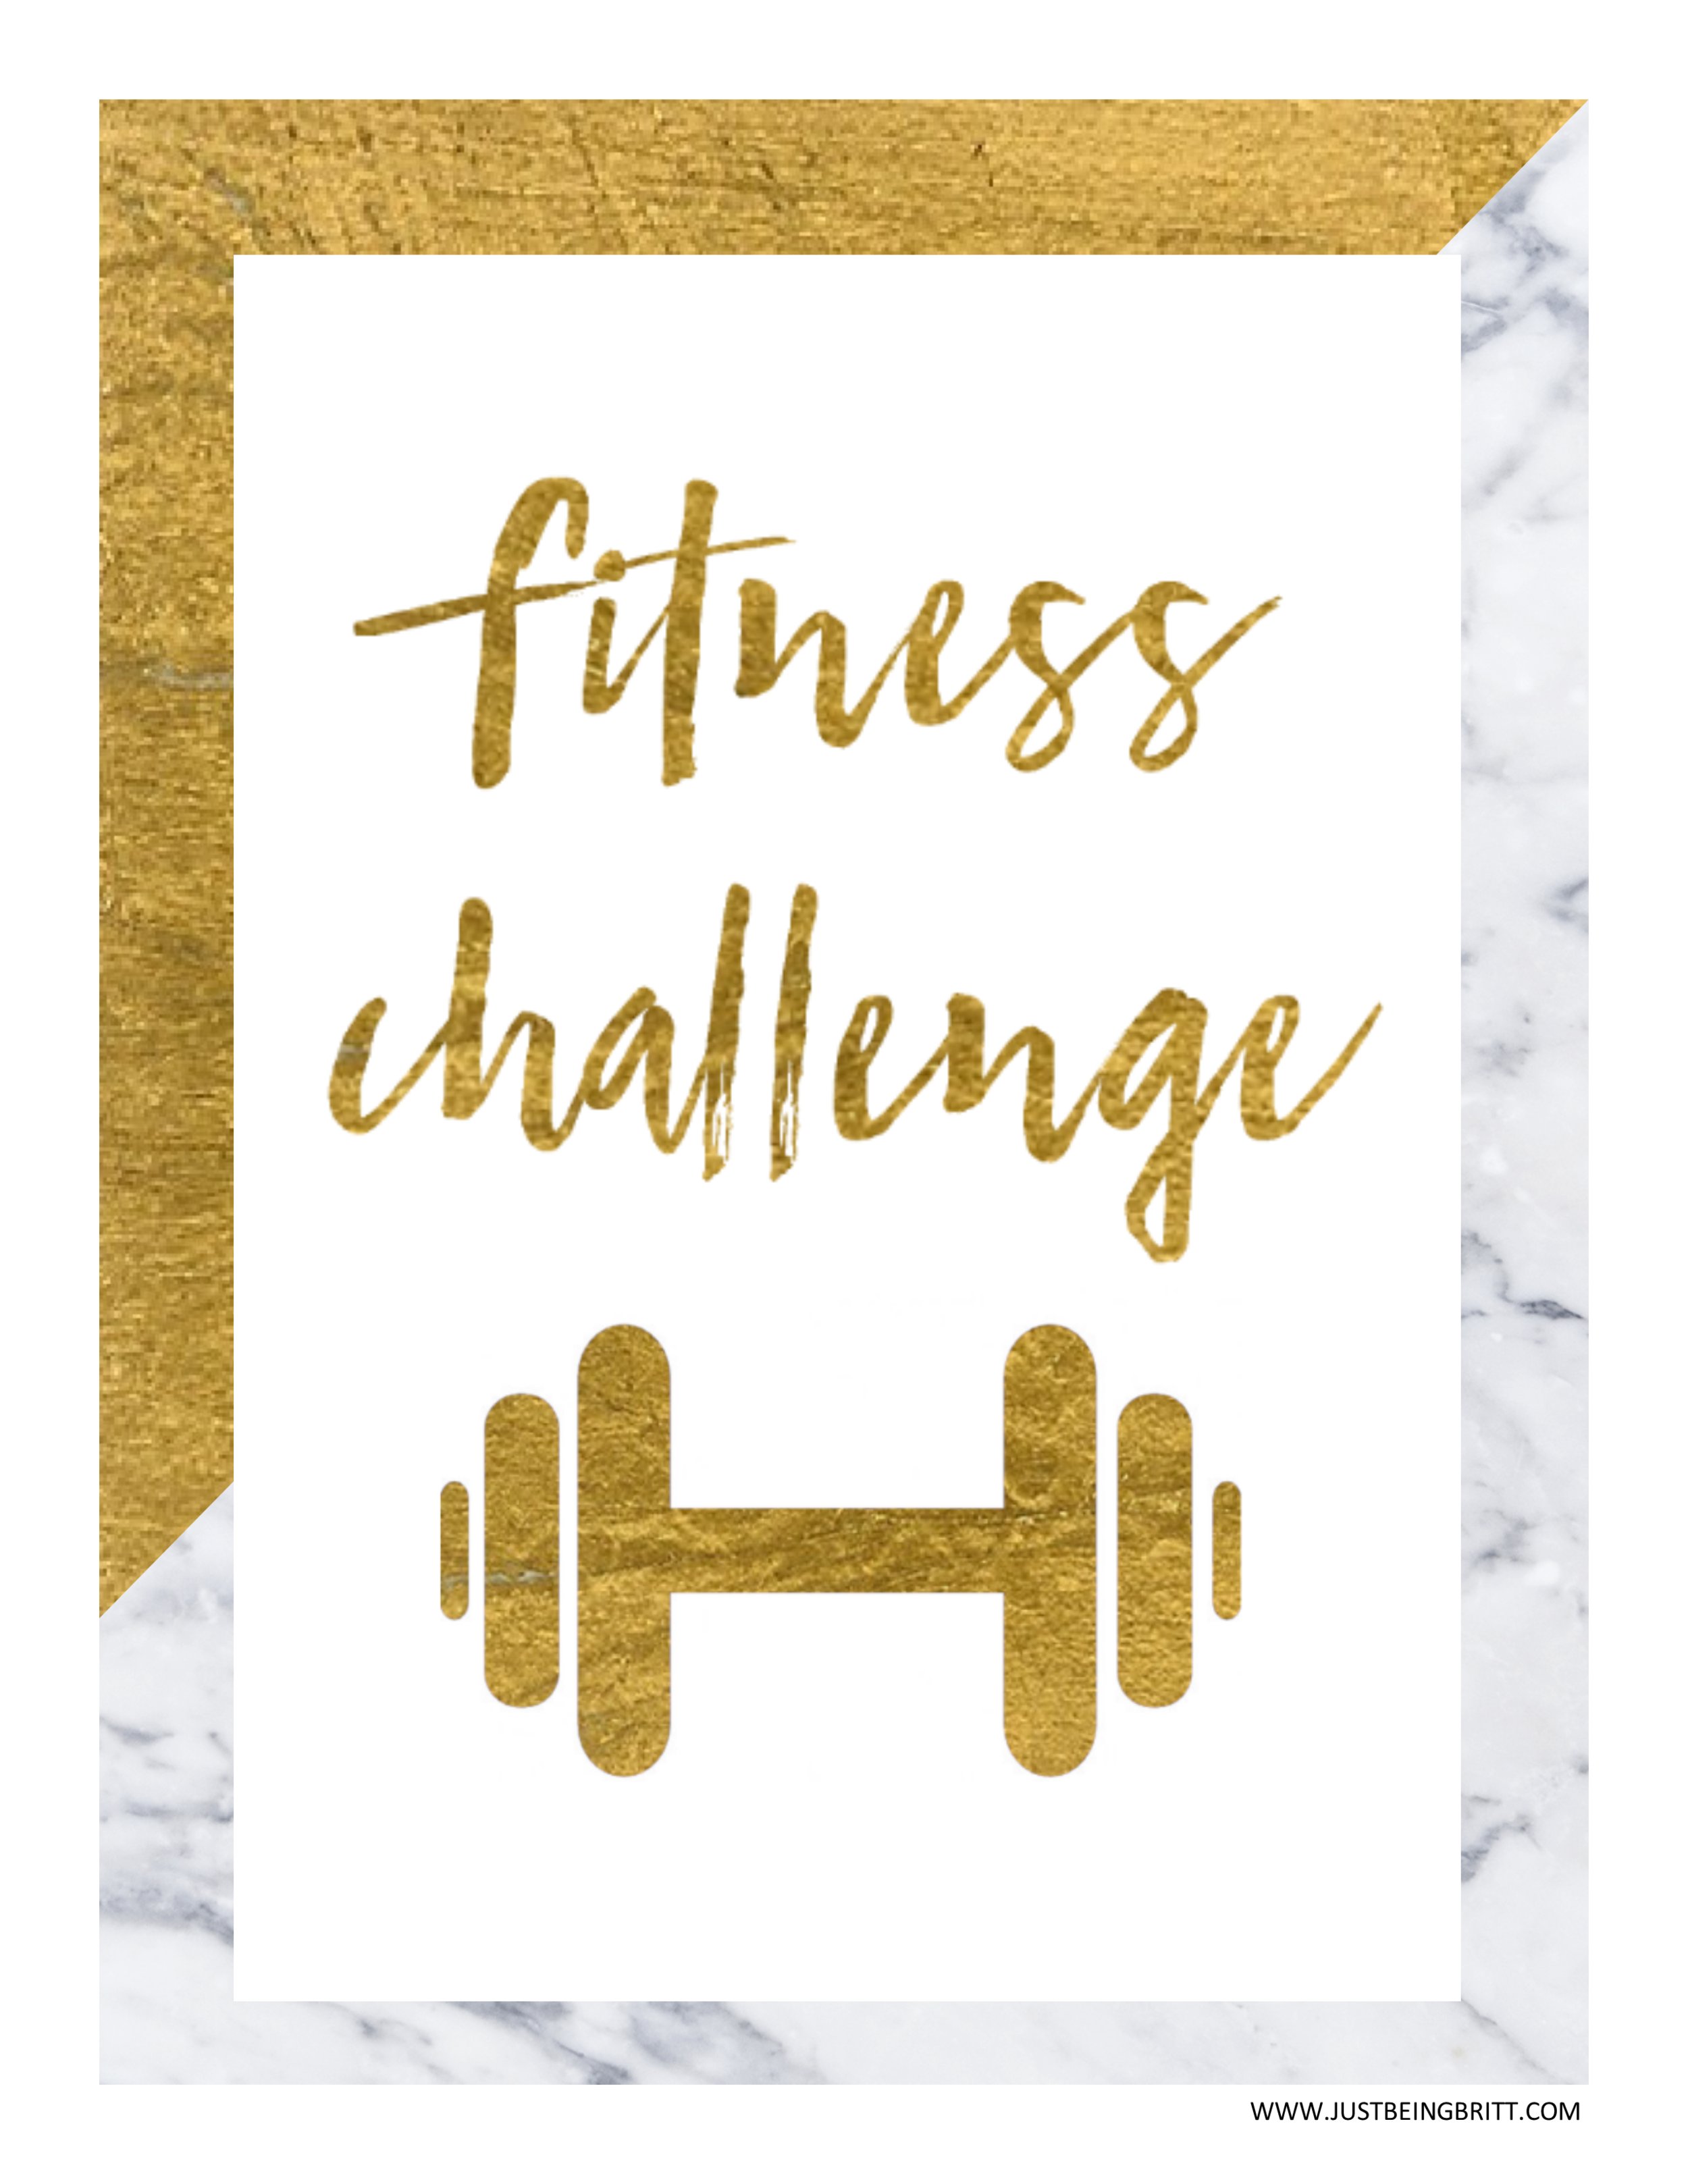 Fitness Lifestyle Blog Just Being Britt Fitness Challenge